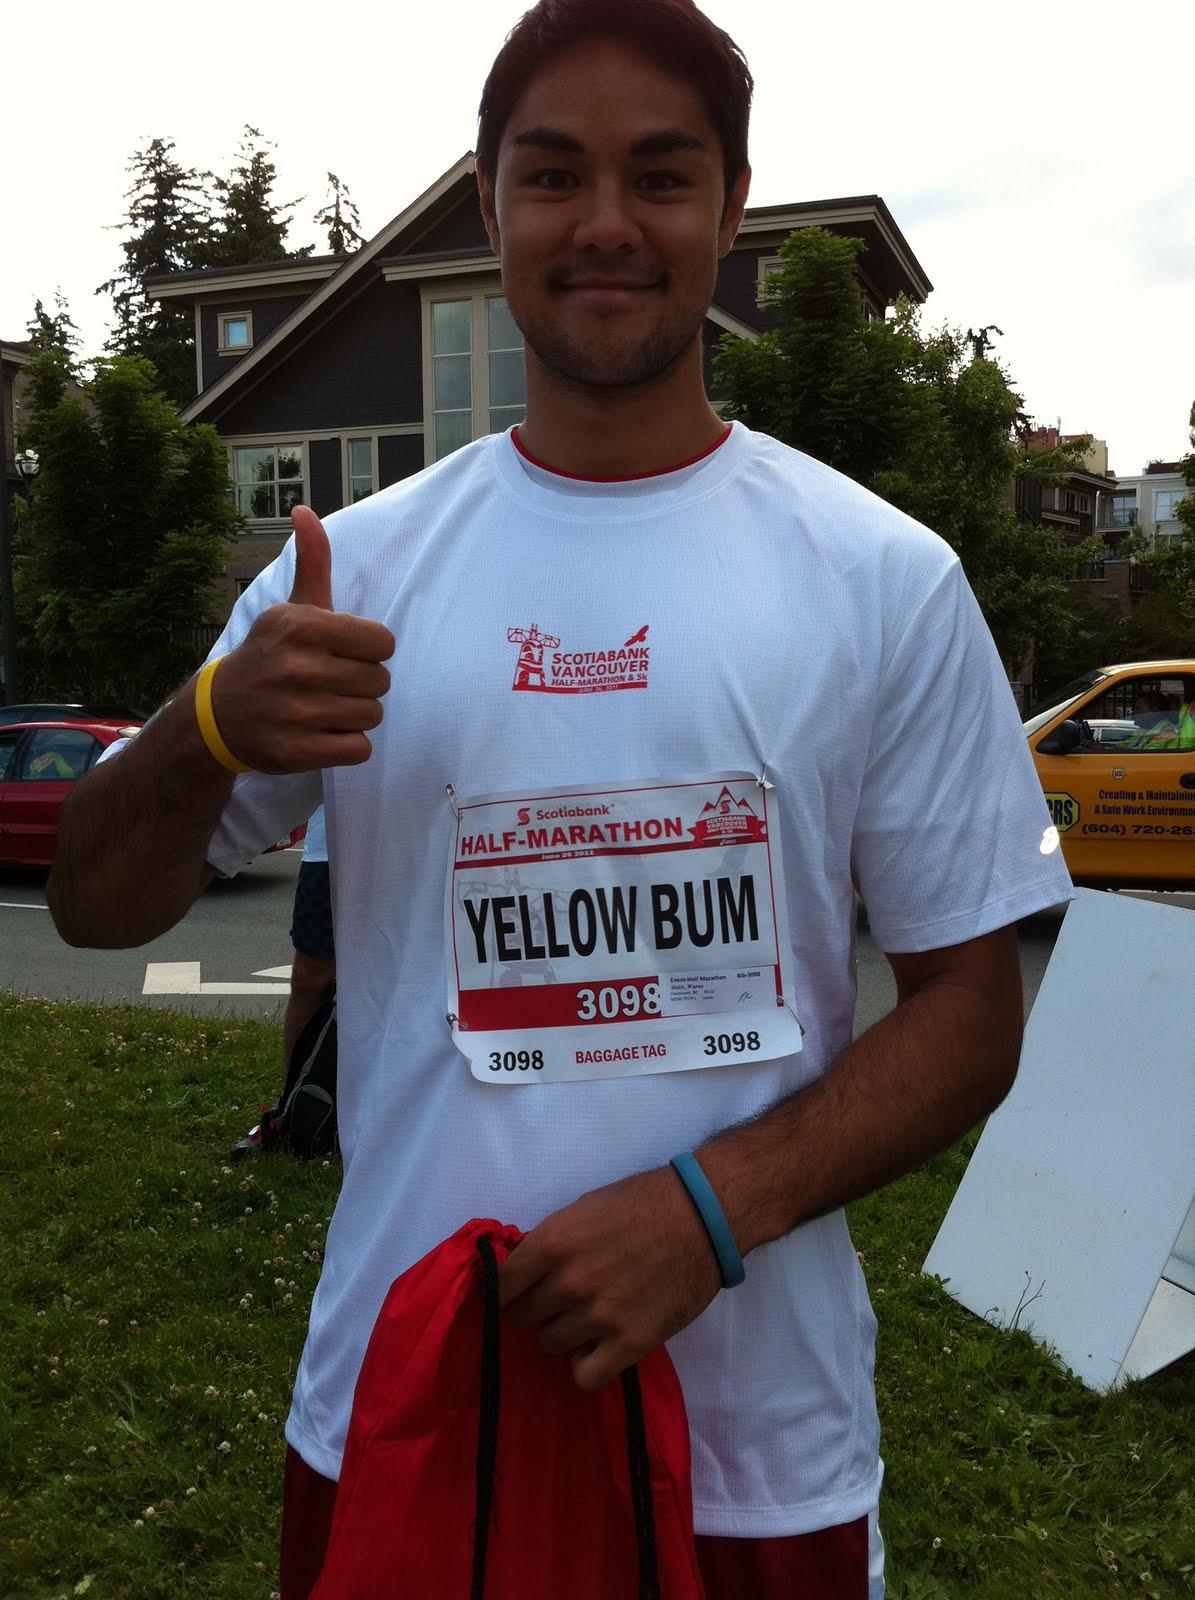 http://3.bp.blogspot.com/-ReWNlZTbk-Y/TgkFhv5xW9I/AAAAAAAAAXY/HempWK8YlZ8/s1600/yellow%2Bbum.jpg